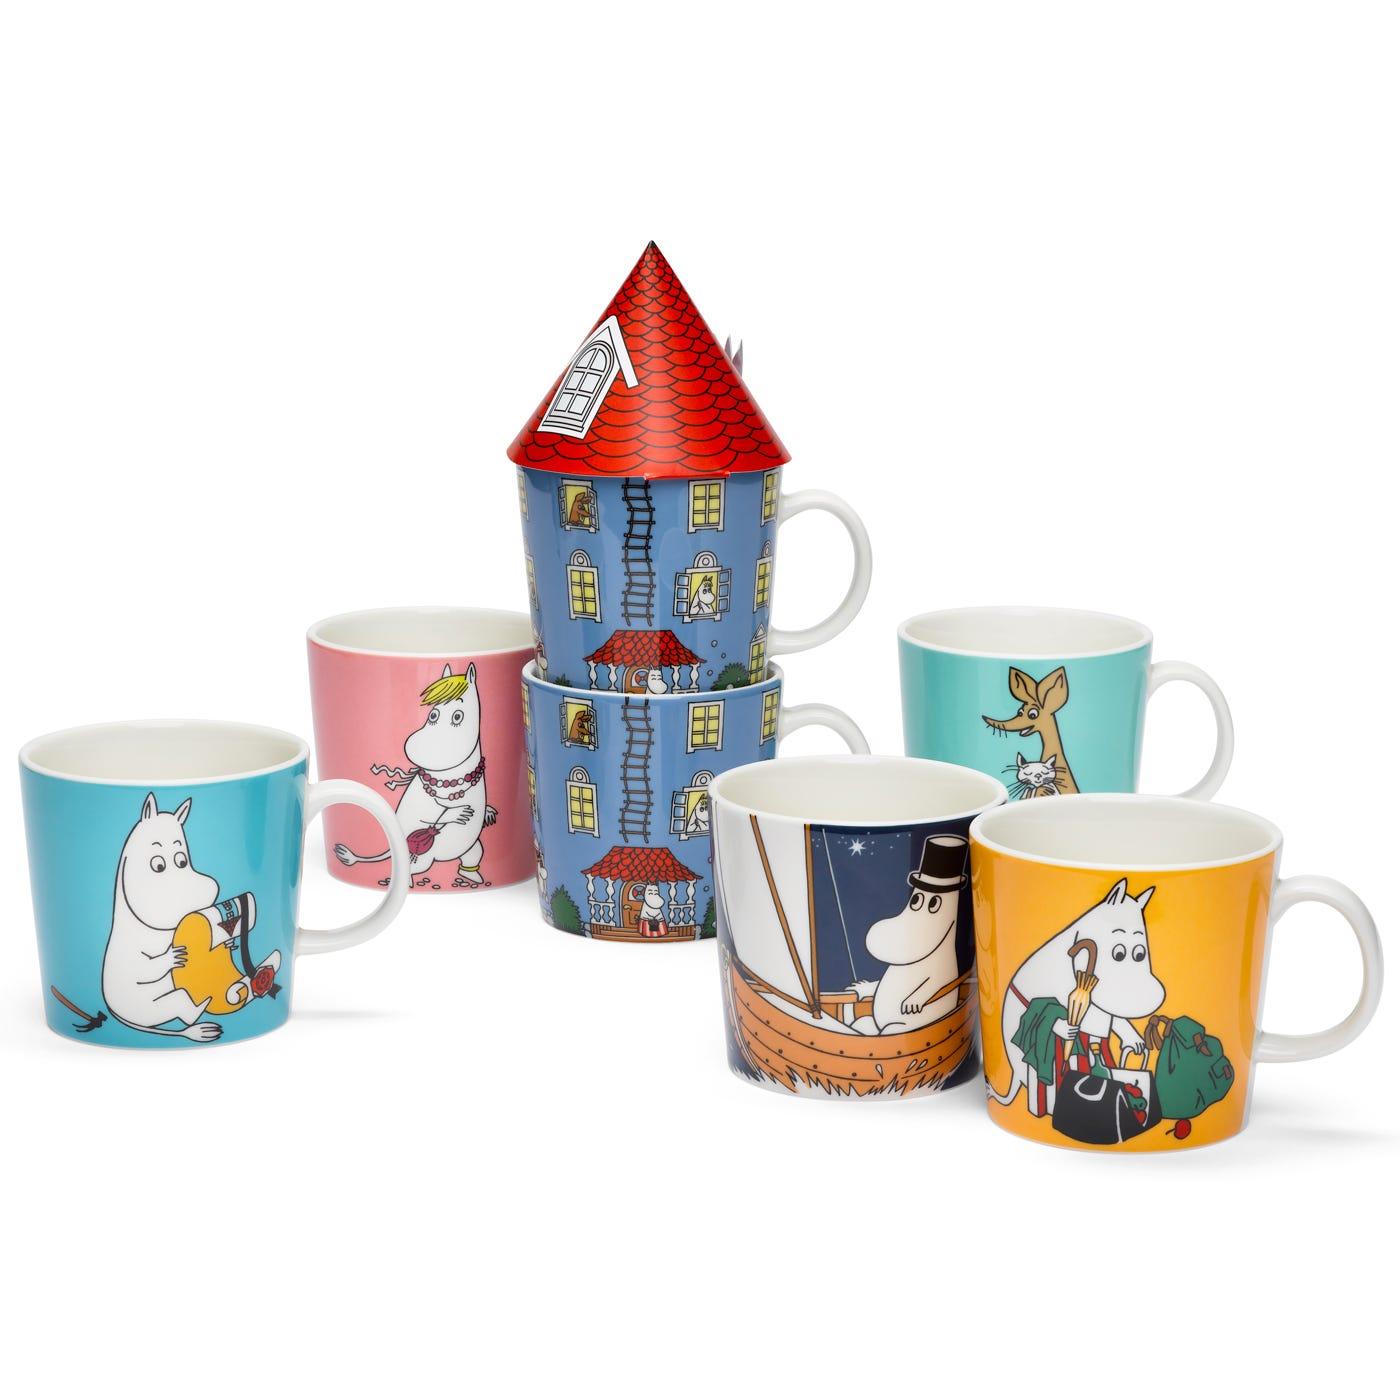 Arabia Moomins Mug